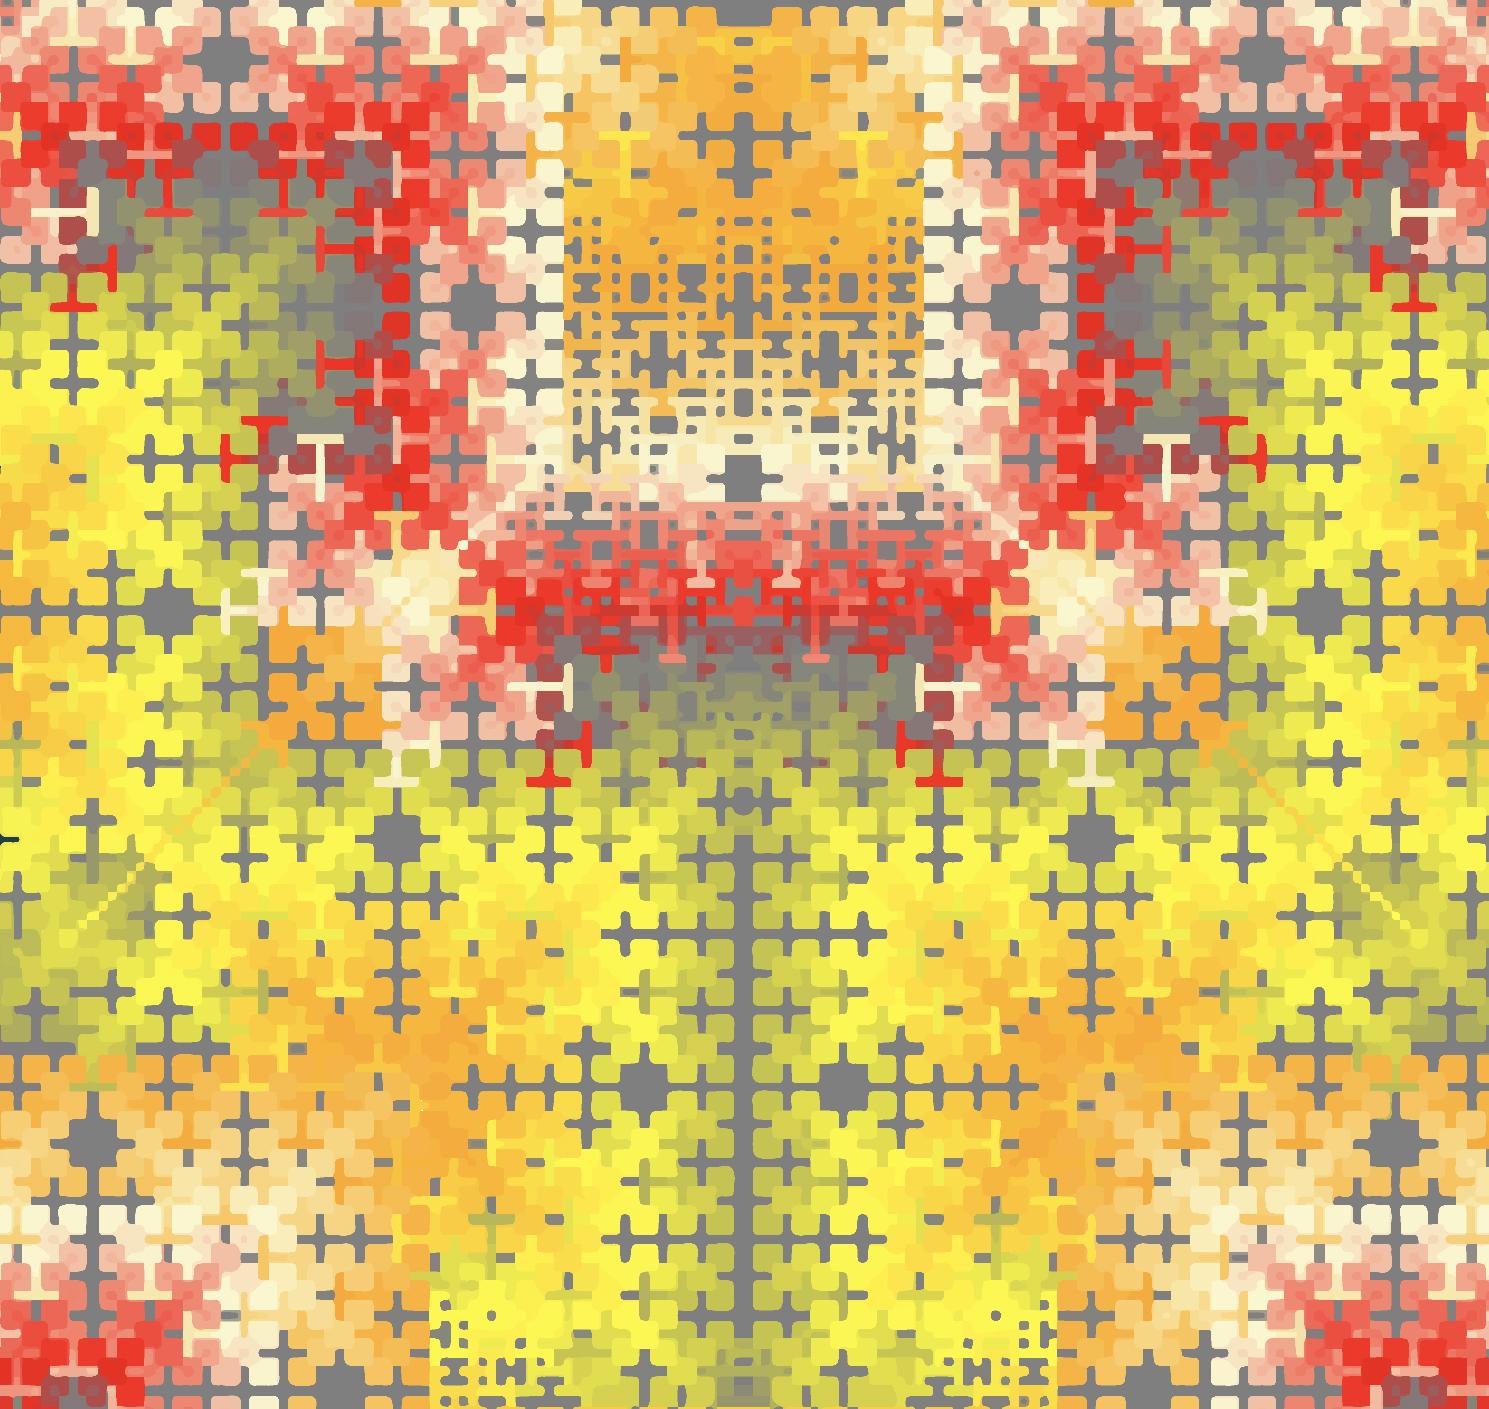 jcriscola_fractor_detail2